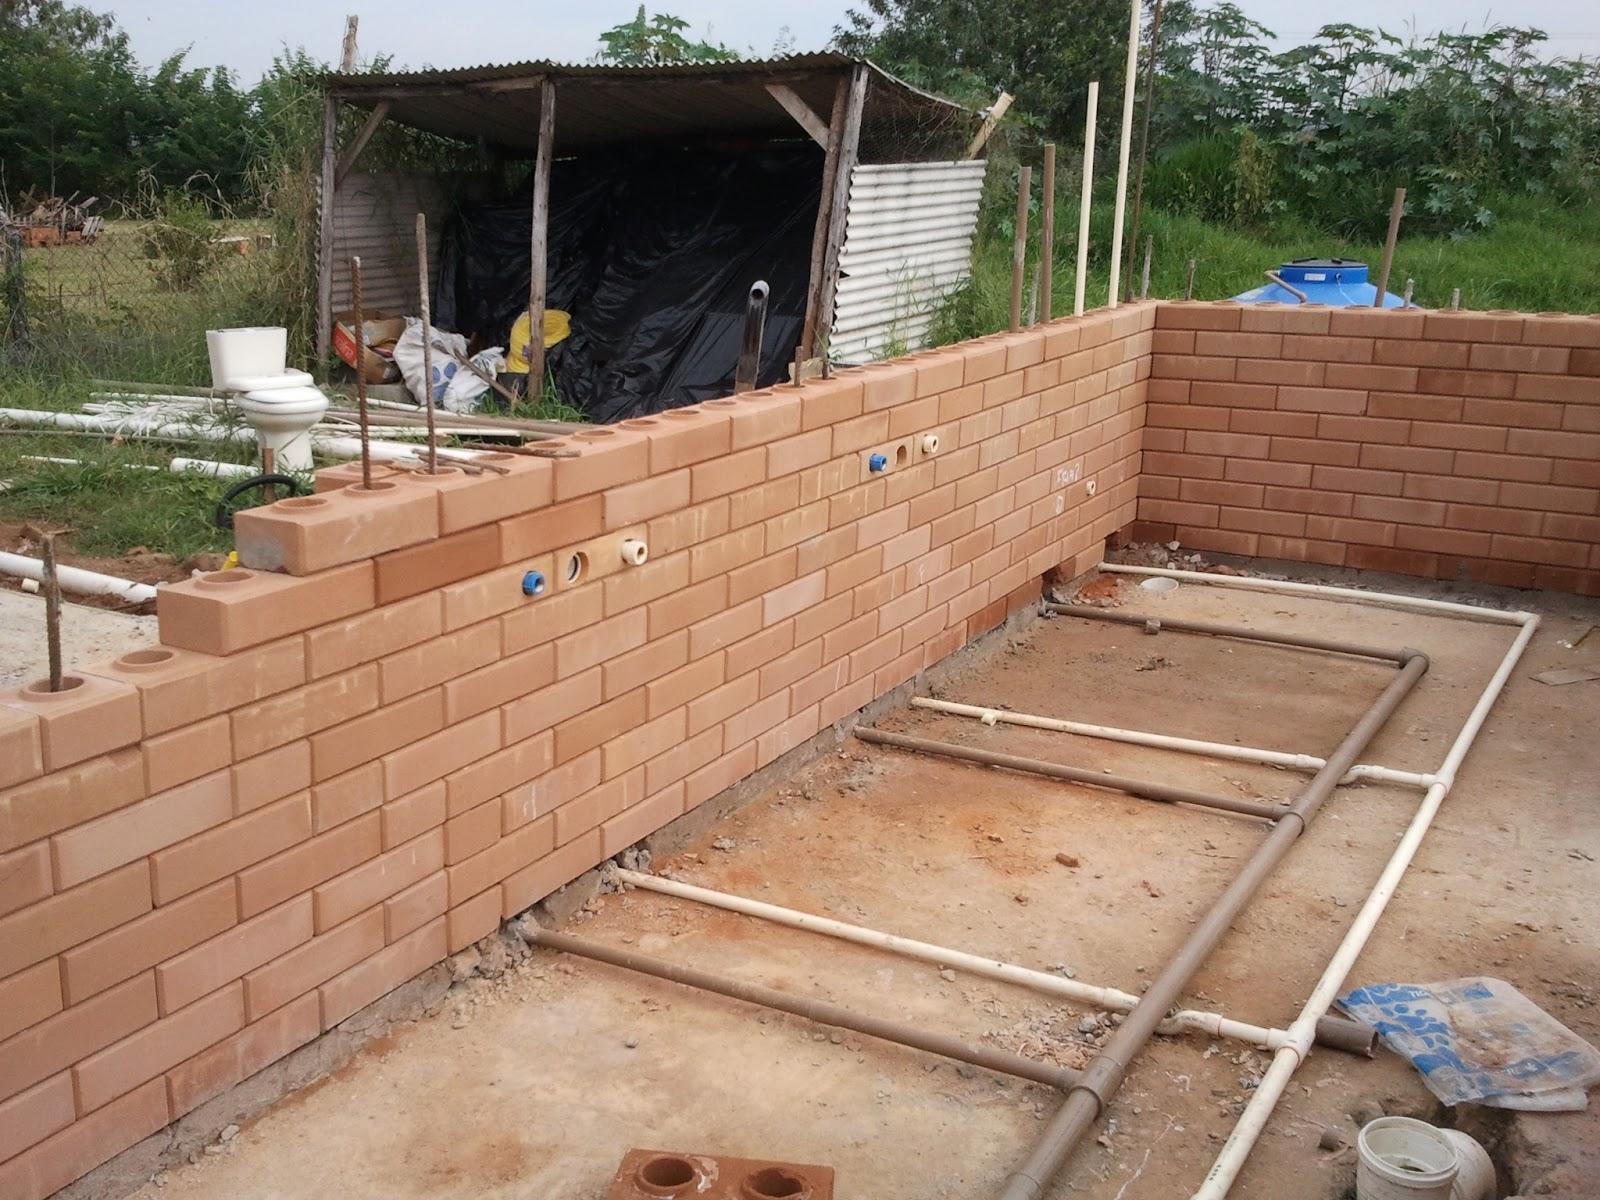 Construindo e Ampliando com Tijolo Solo cimento / Ecológico: Junho  #8D5E3E 1600 1200